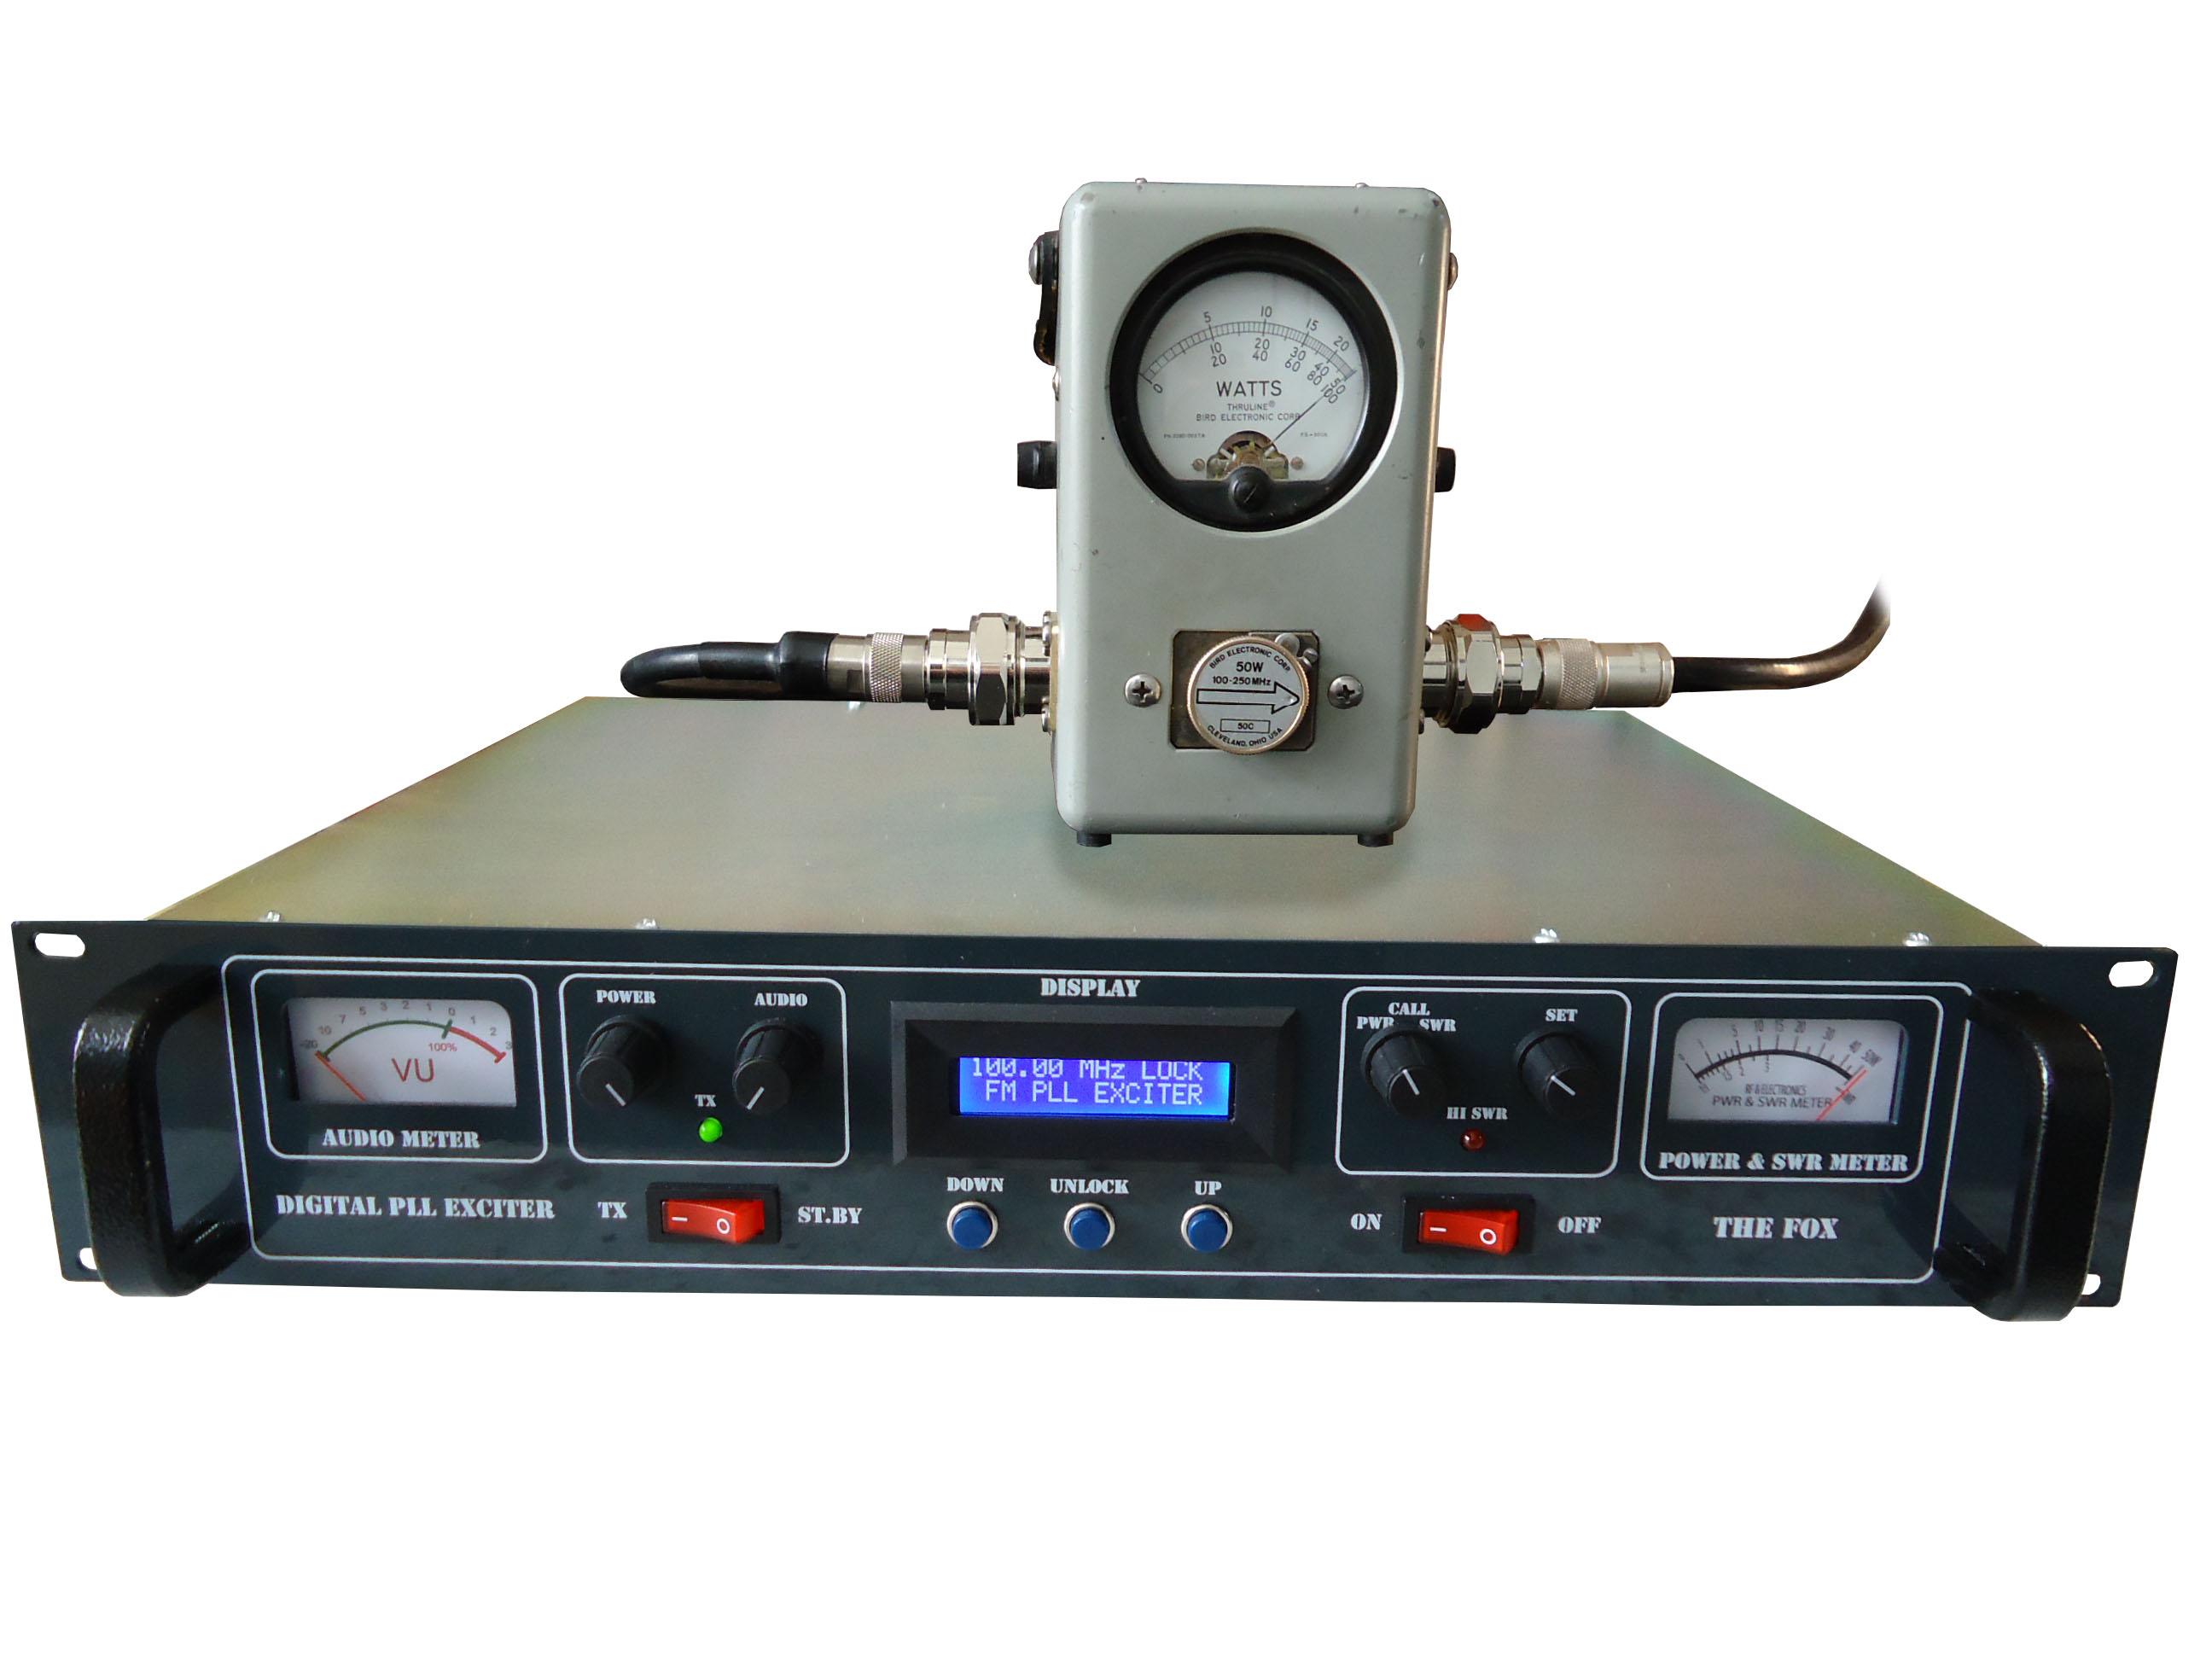 Build a radio transmitter class